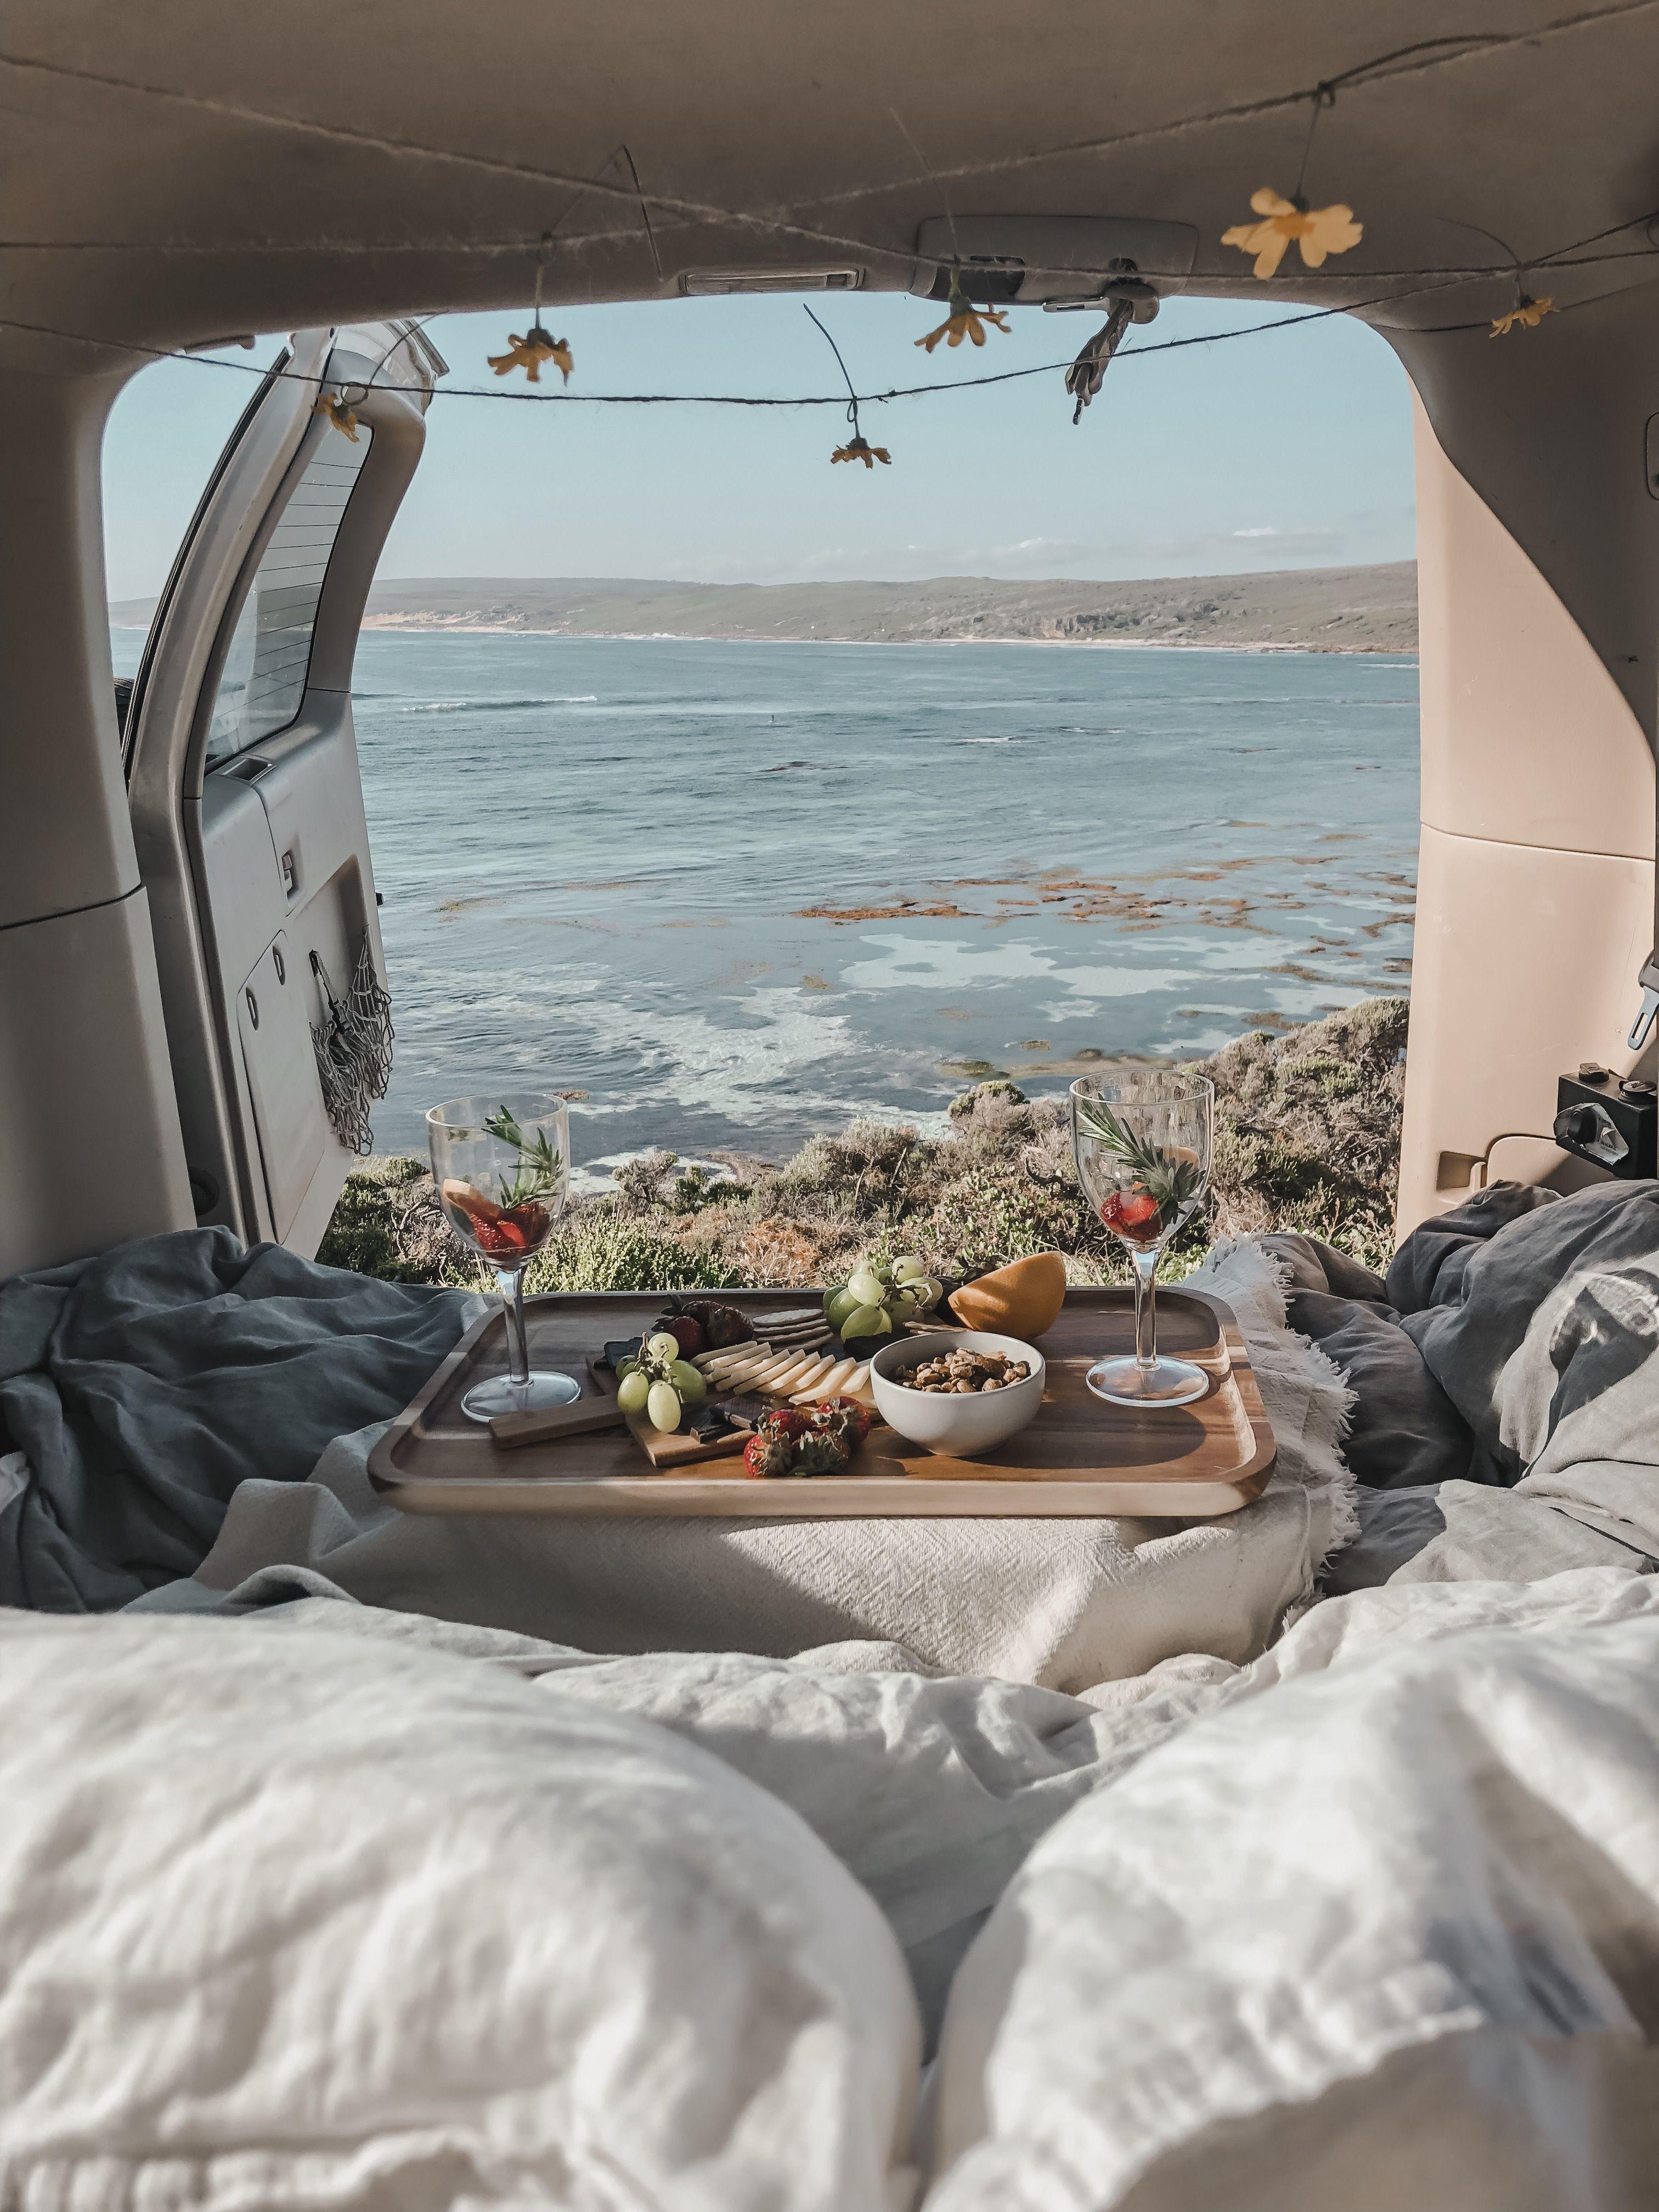 Dreamy back of car date in margaret river western